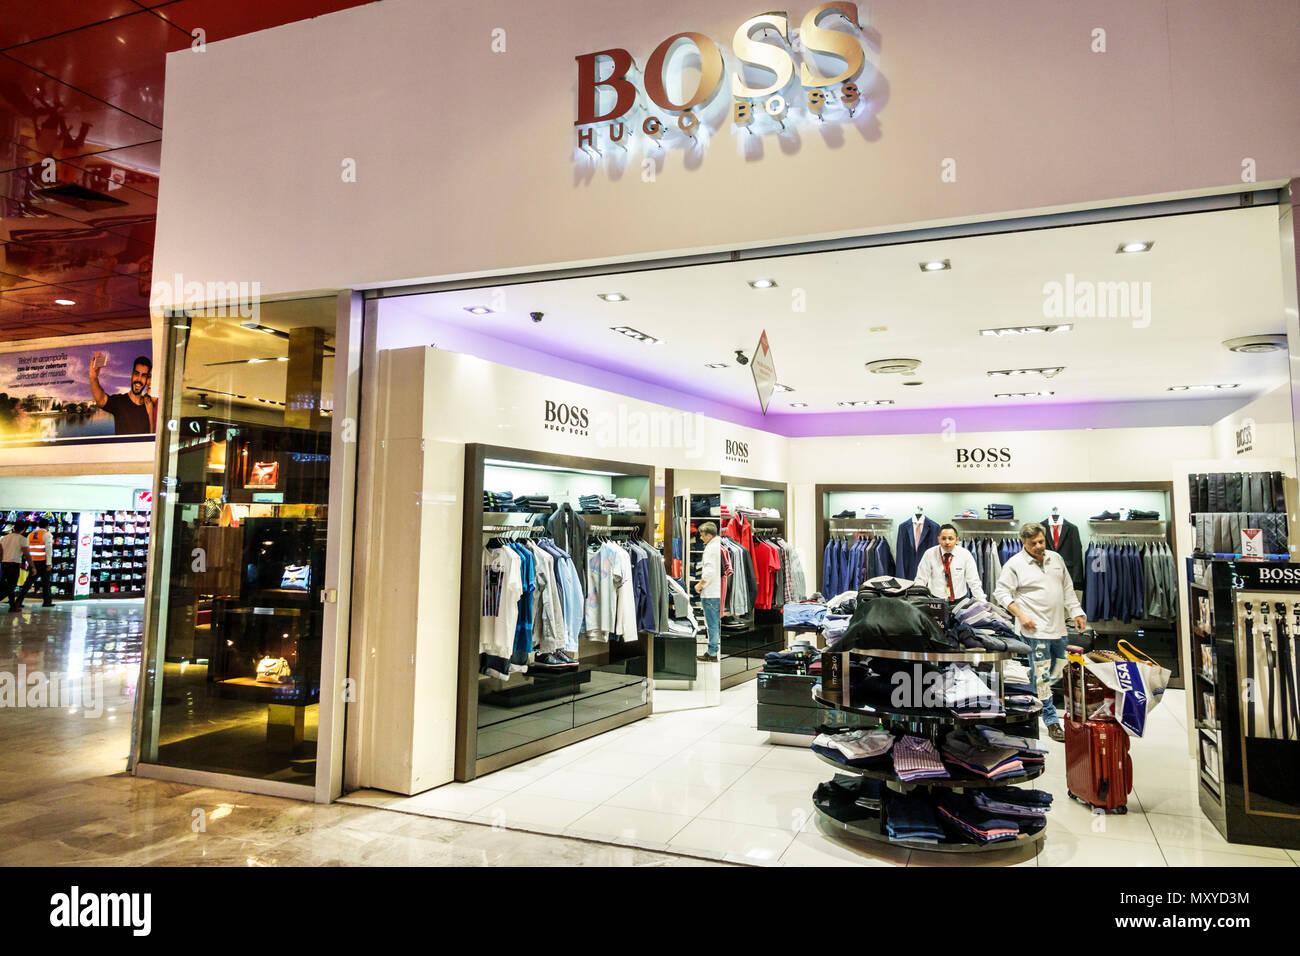 hugo boss shop in stock photos hugo boss shop in stock. Black Bedroom Furniture Sets. Home Design Ideas